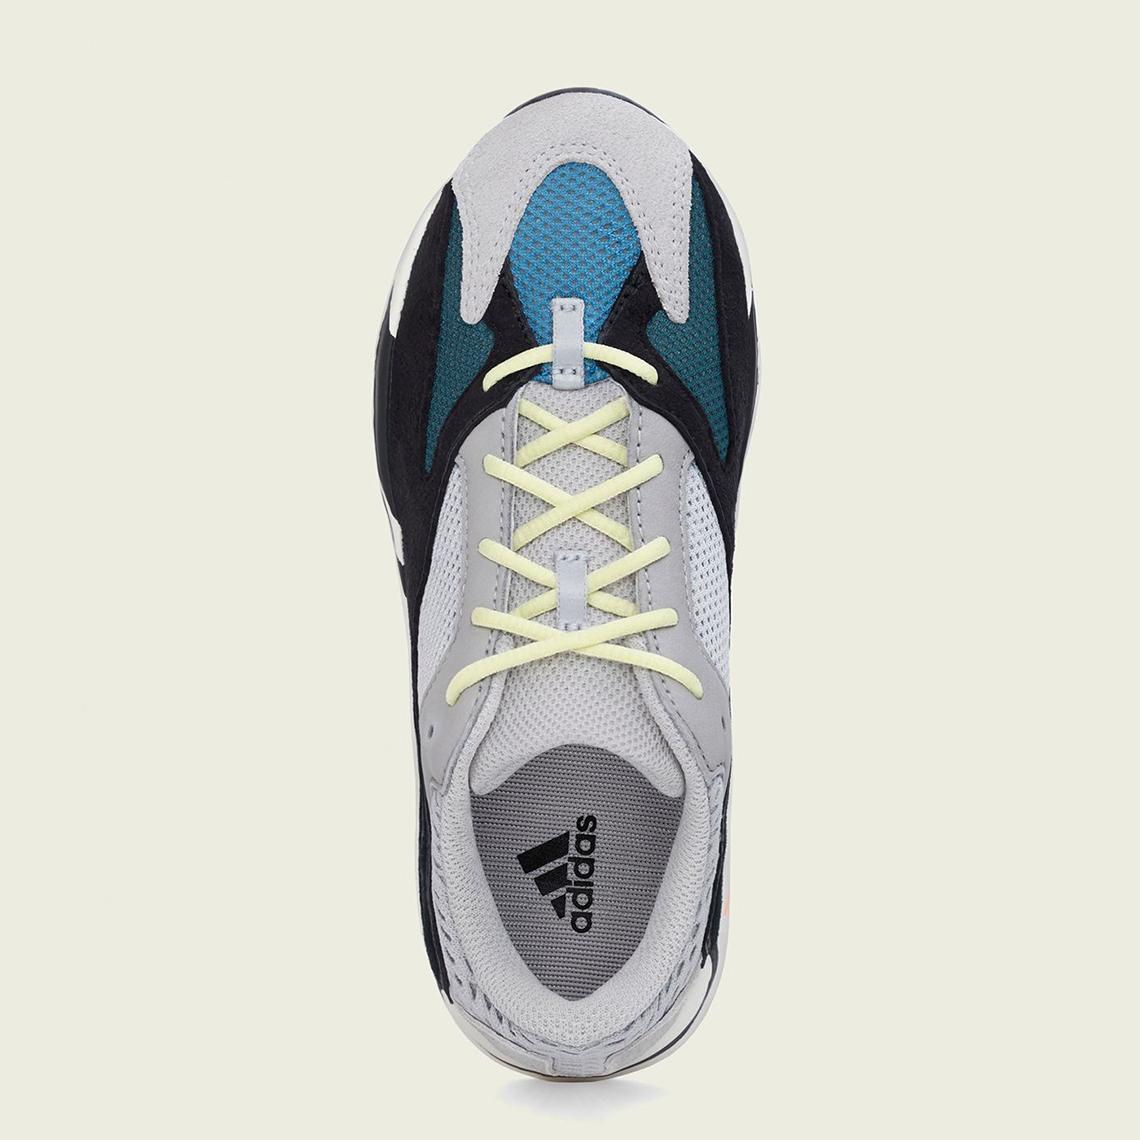 adidas Yeezy 700 Waverunner 2019